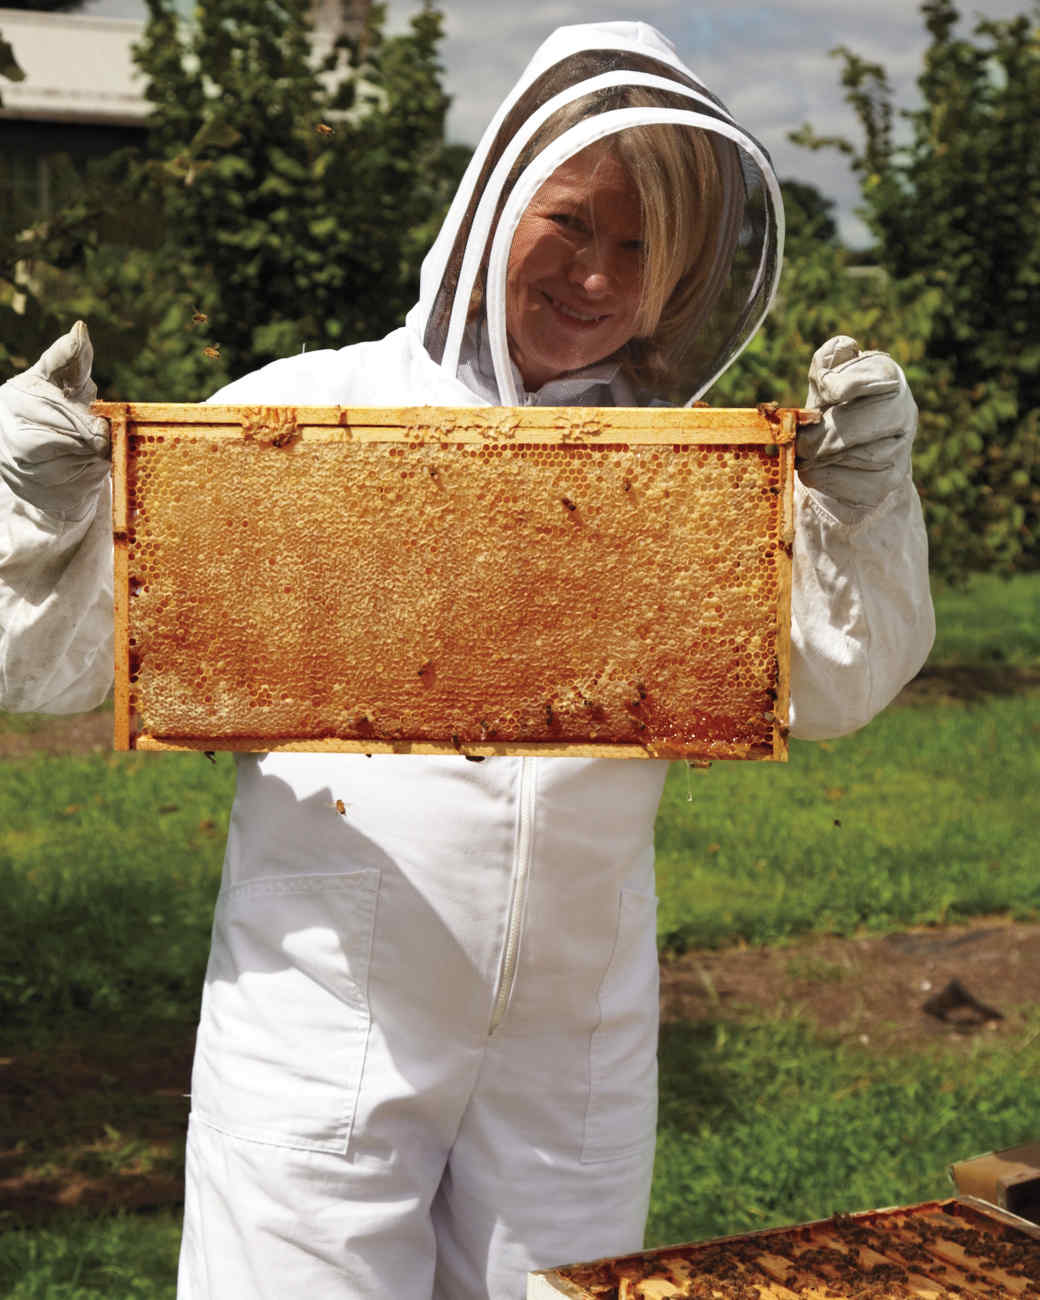 hive-maintenance-6-ms-column-0688-mld106618.jpg